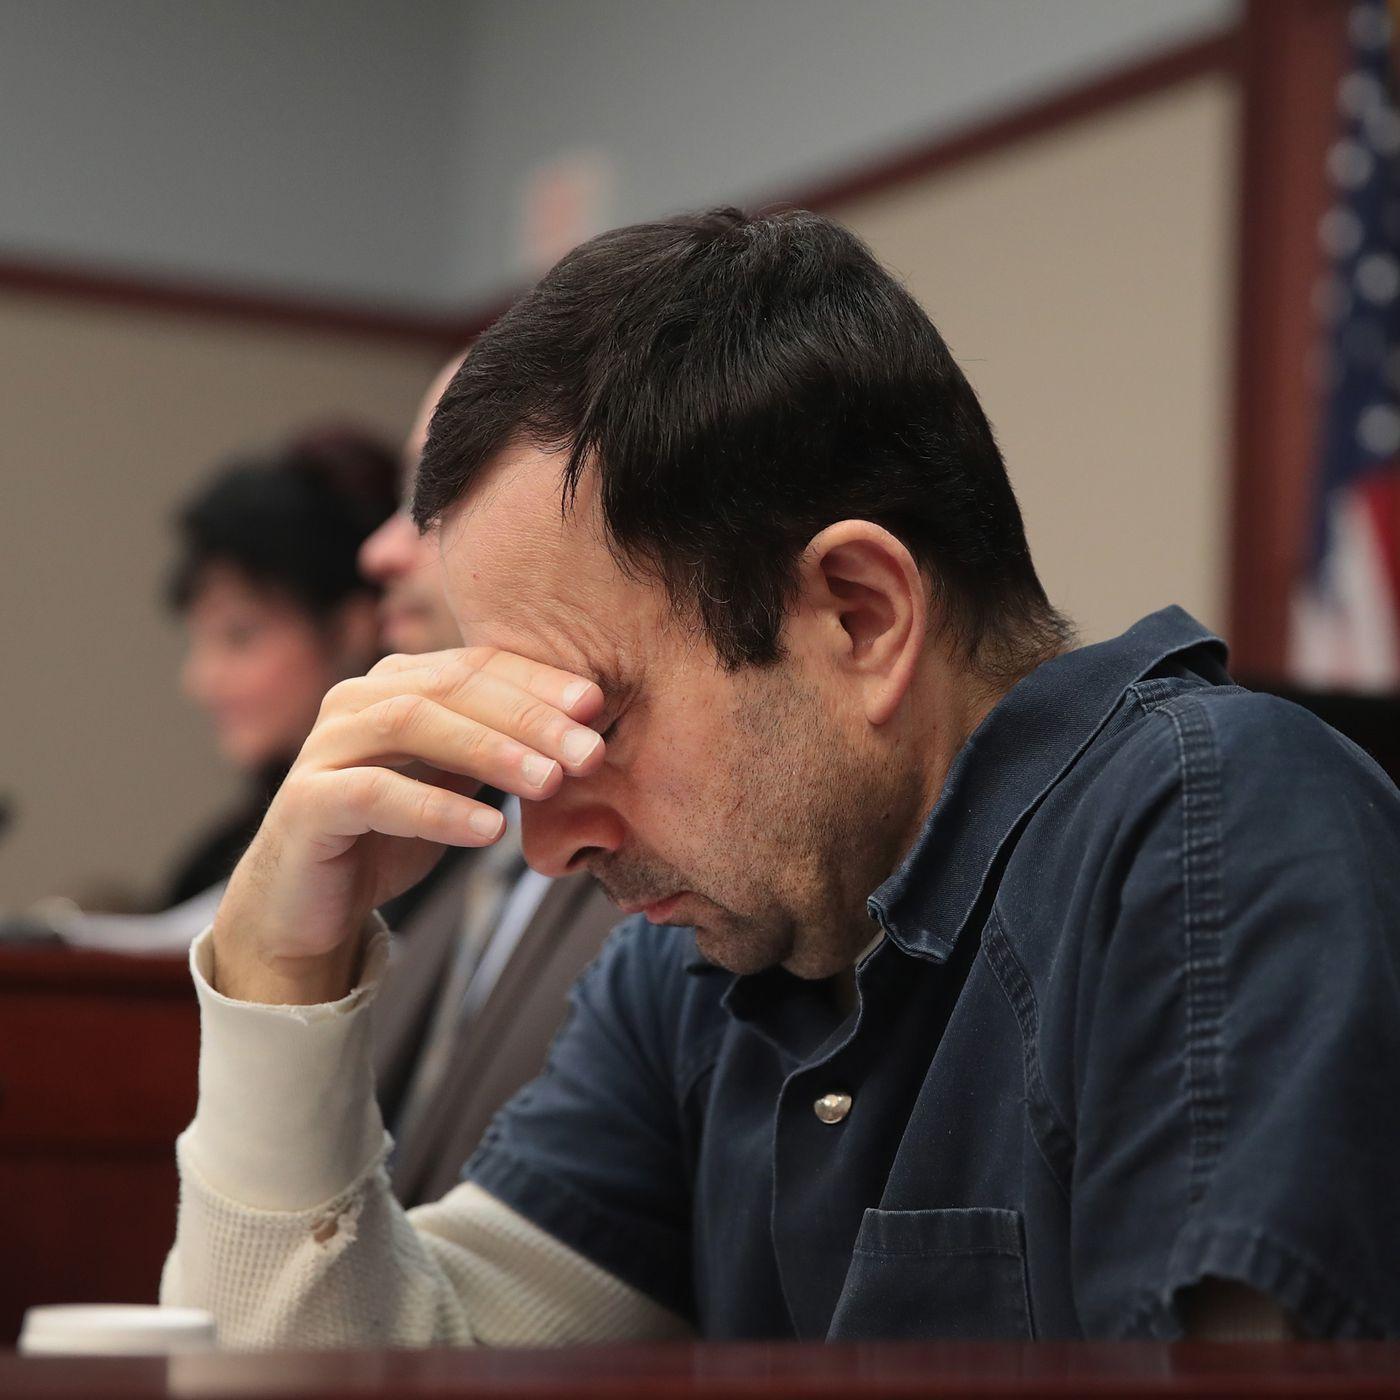 The sex abuse scandal surrounding USA Gymnastics team doctor